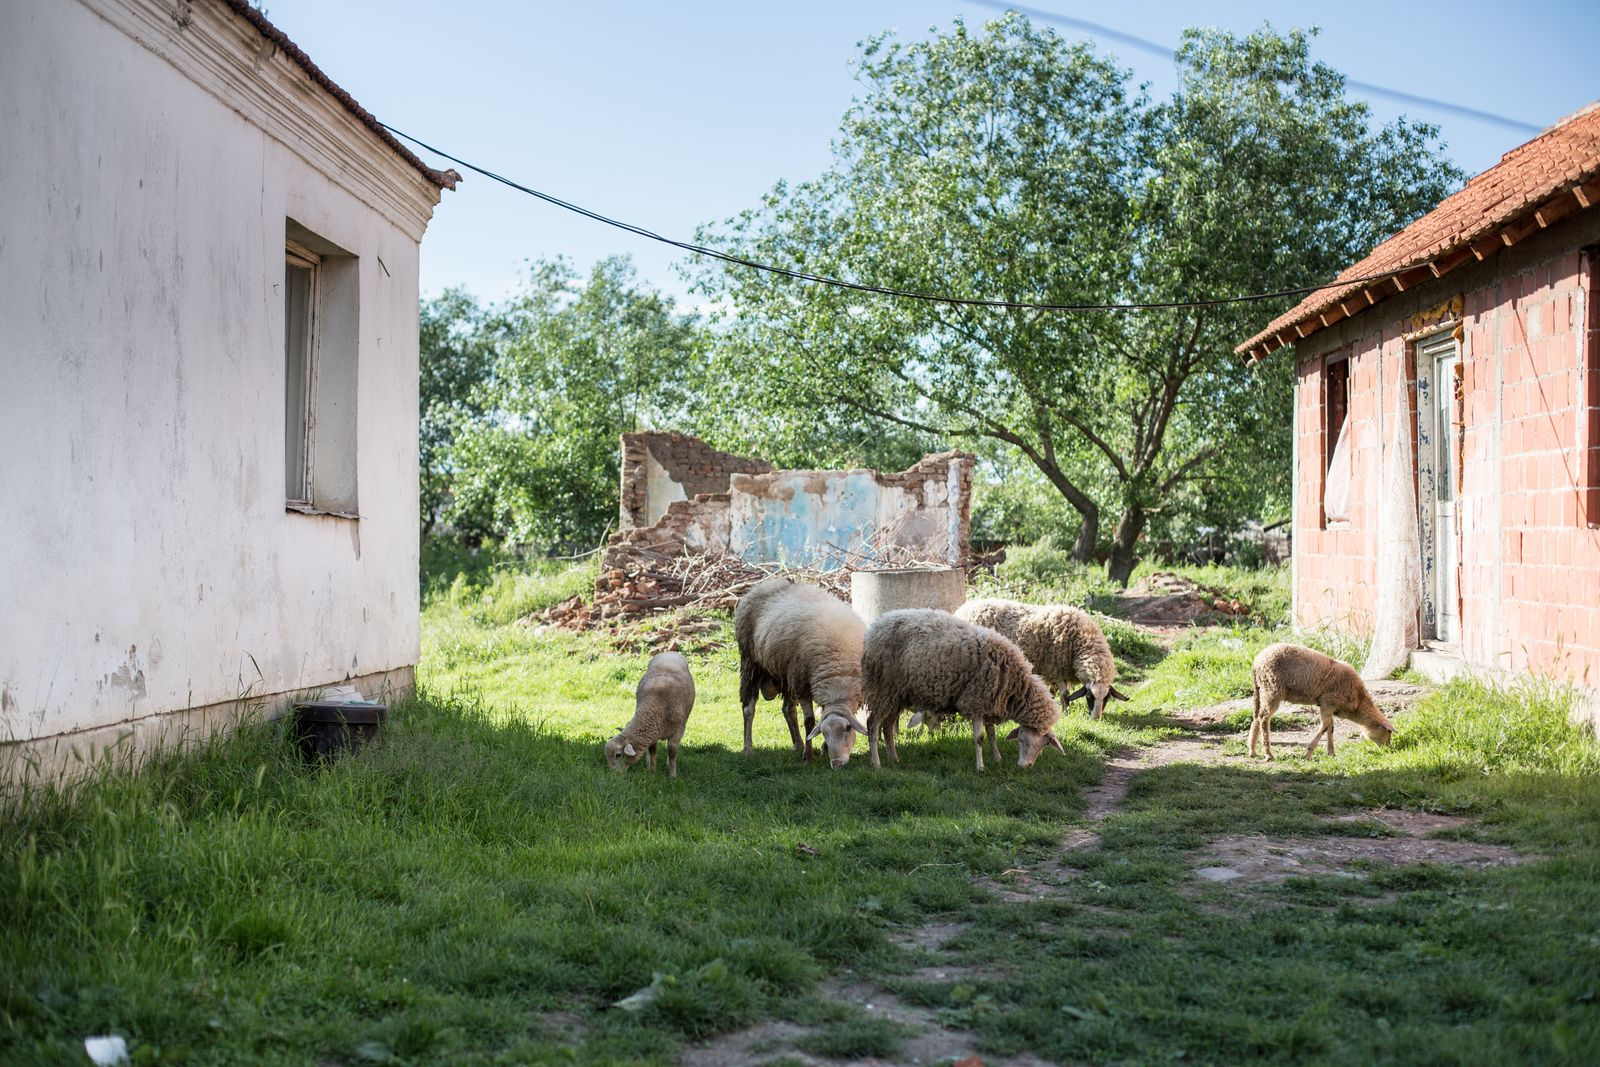 New Arrivals/ Kosovo/ Abgeschoben